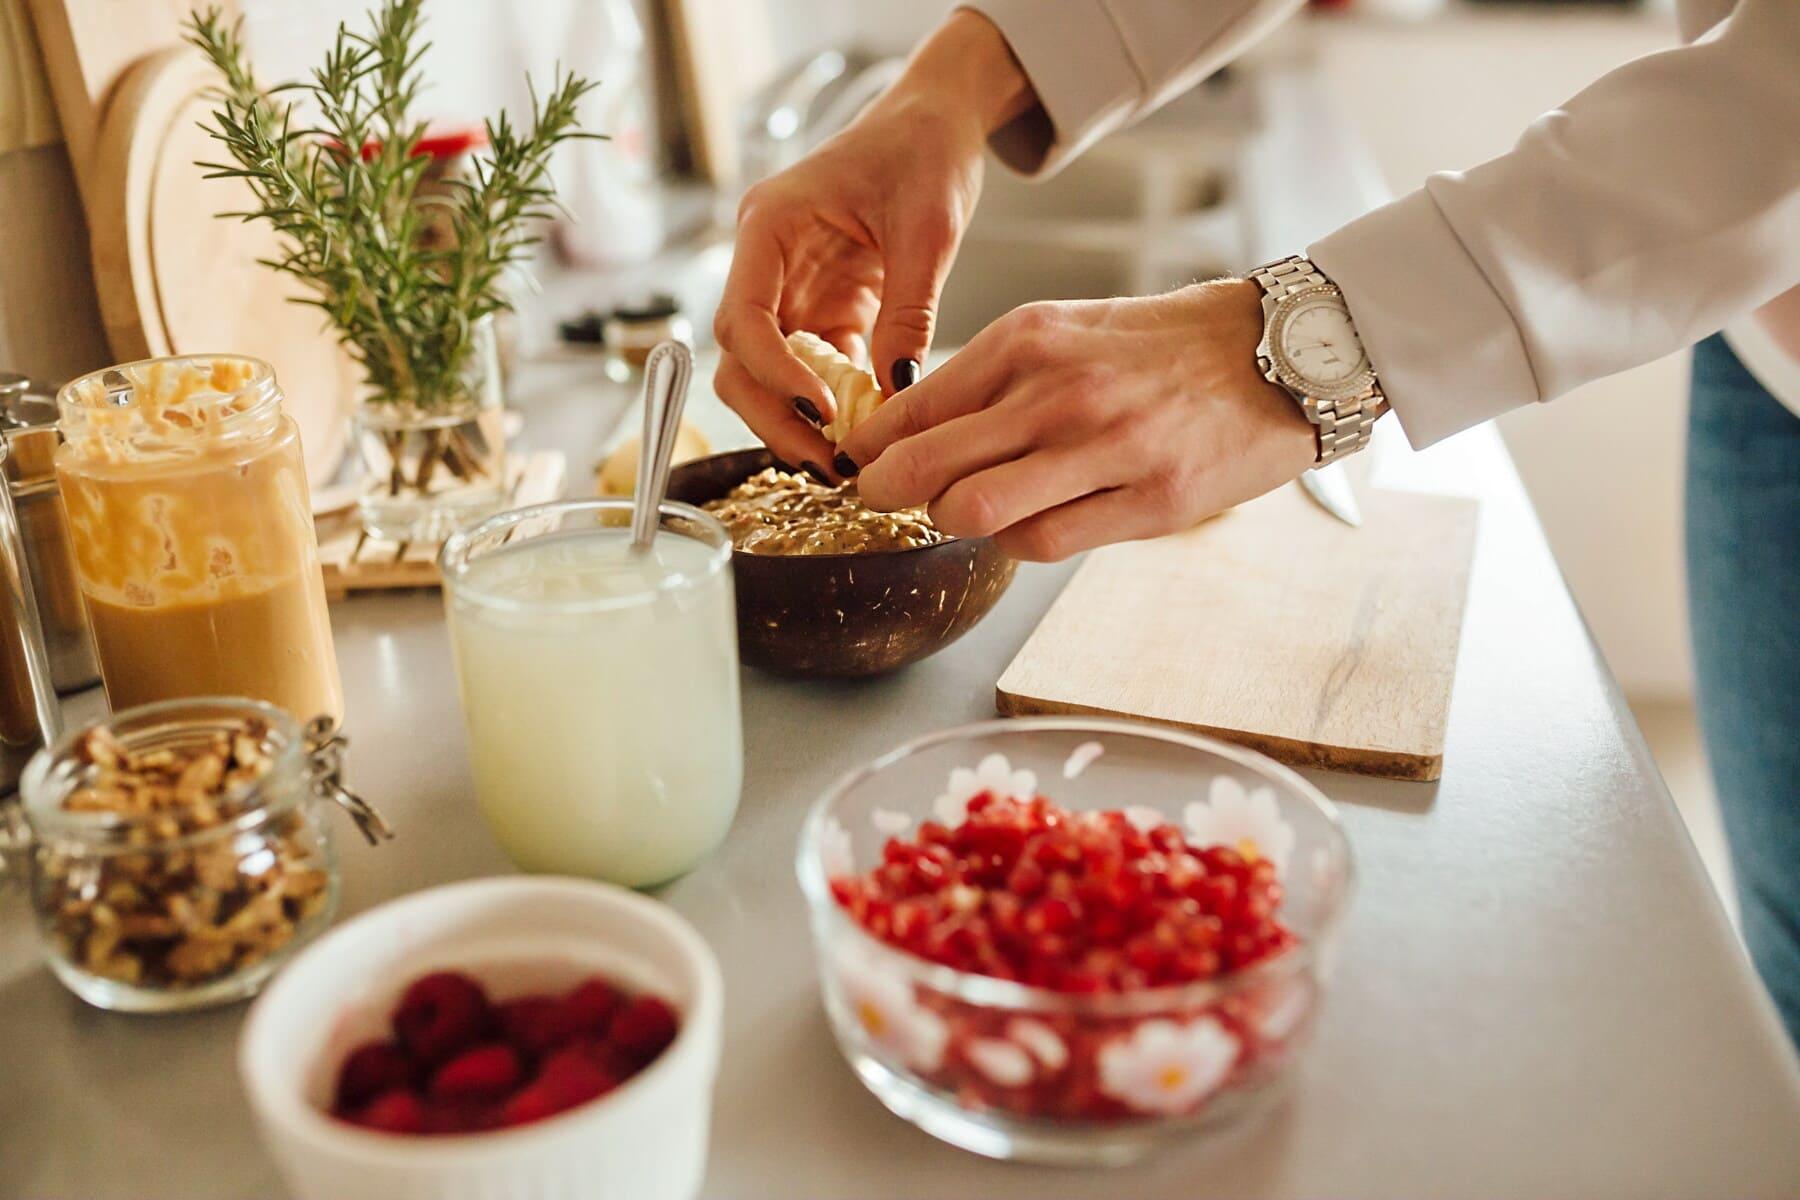 preparation, healthy, breakfast, woman, hands, kitchen table, kitchenware, kitchen, fruit juice, food